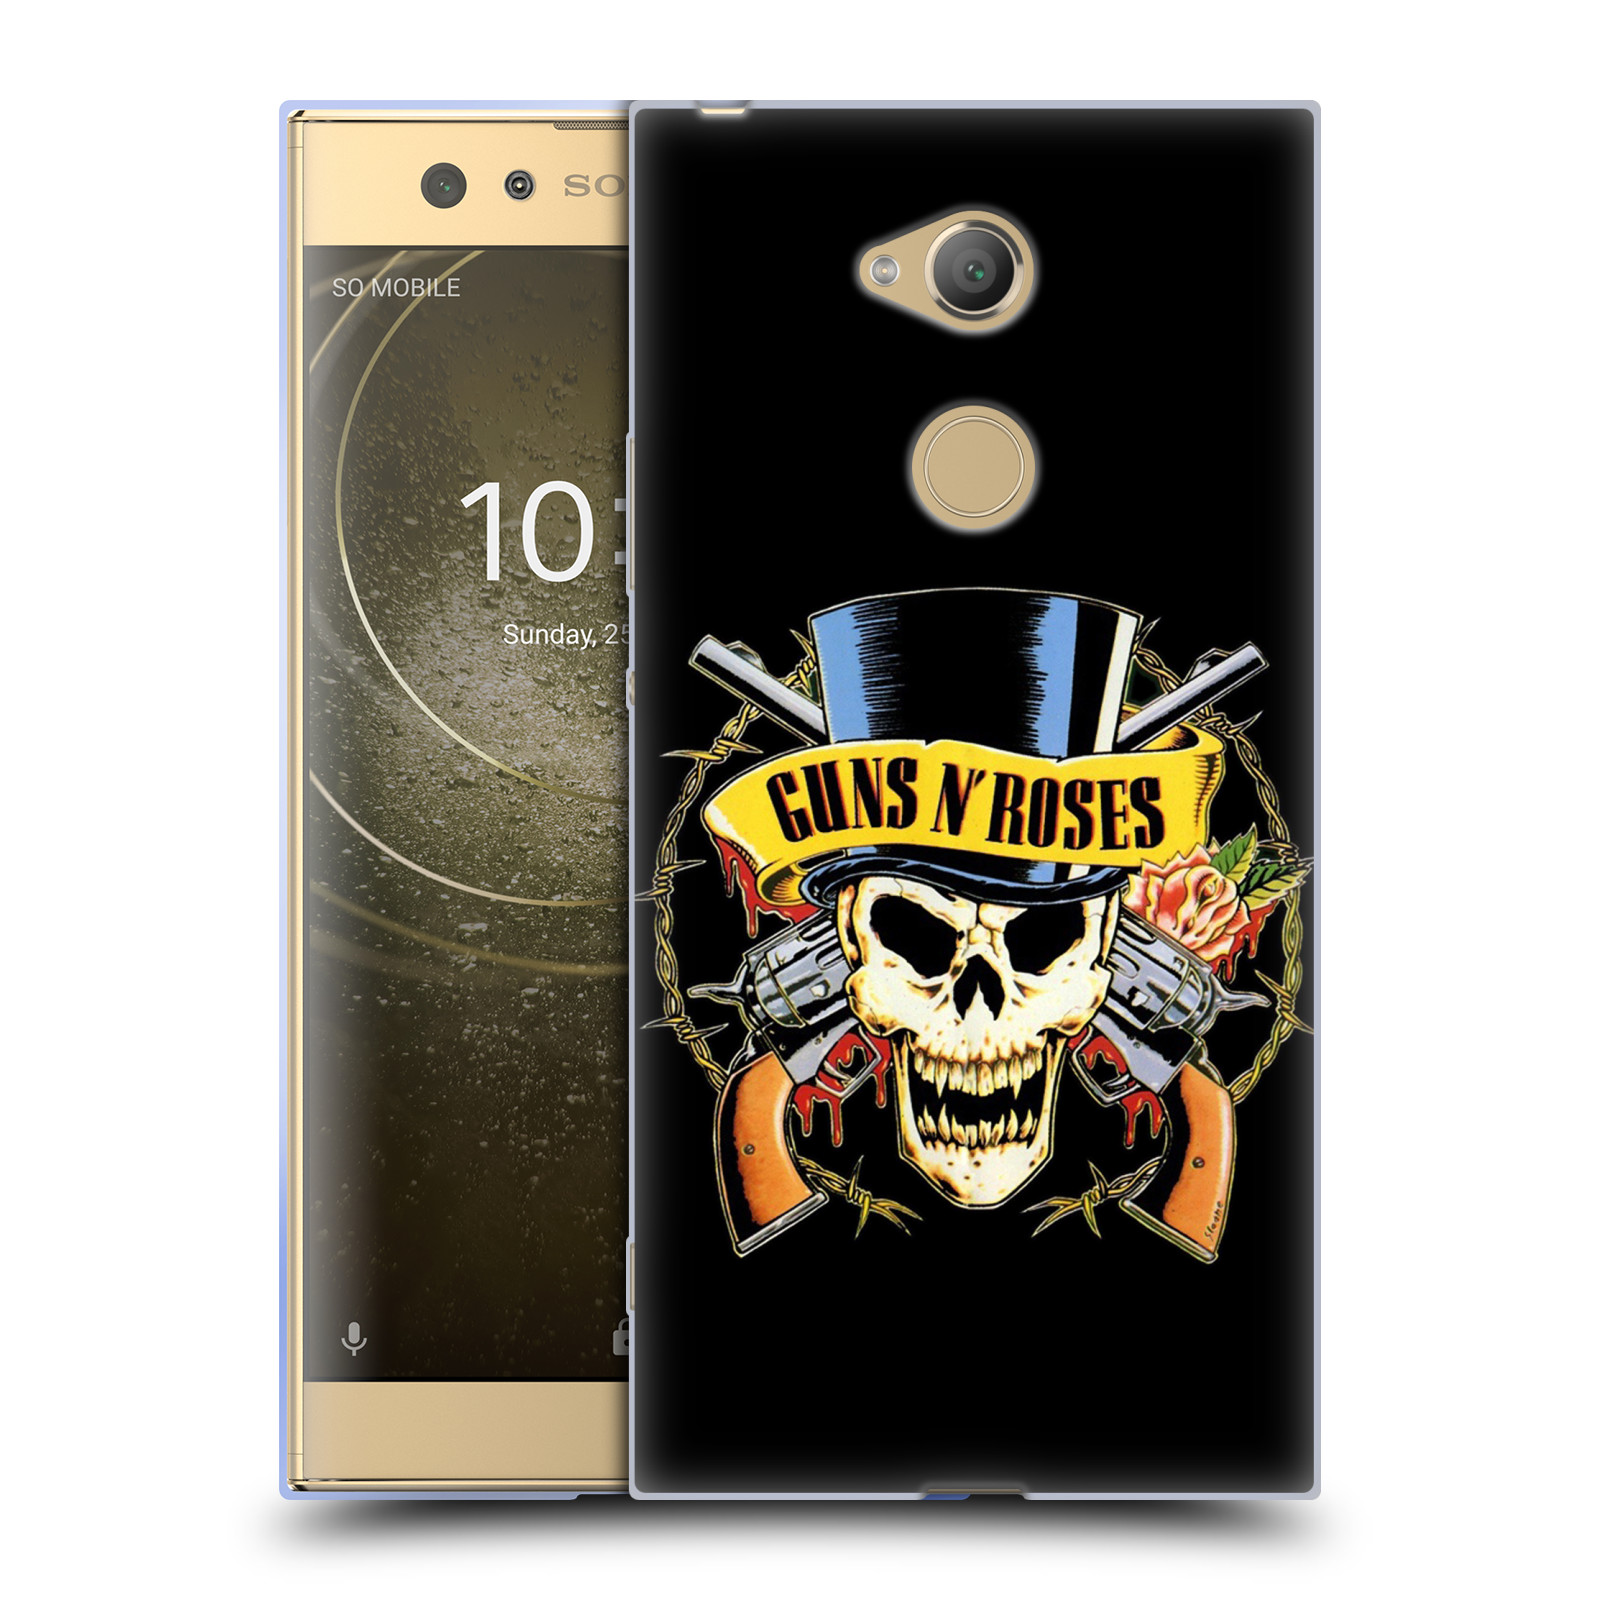 Silikonové pouzdro na mobil Sony Xperia XA2 Ultra - Head Case - Guns N' Roses - Lebka